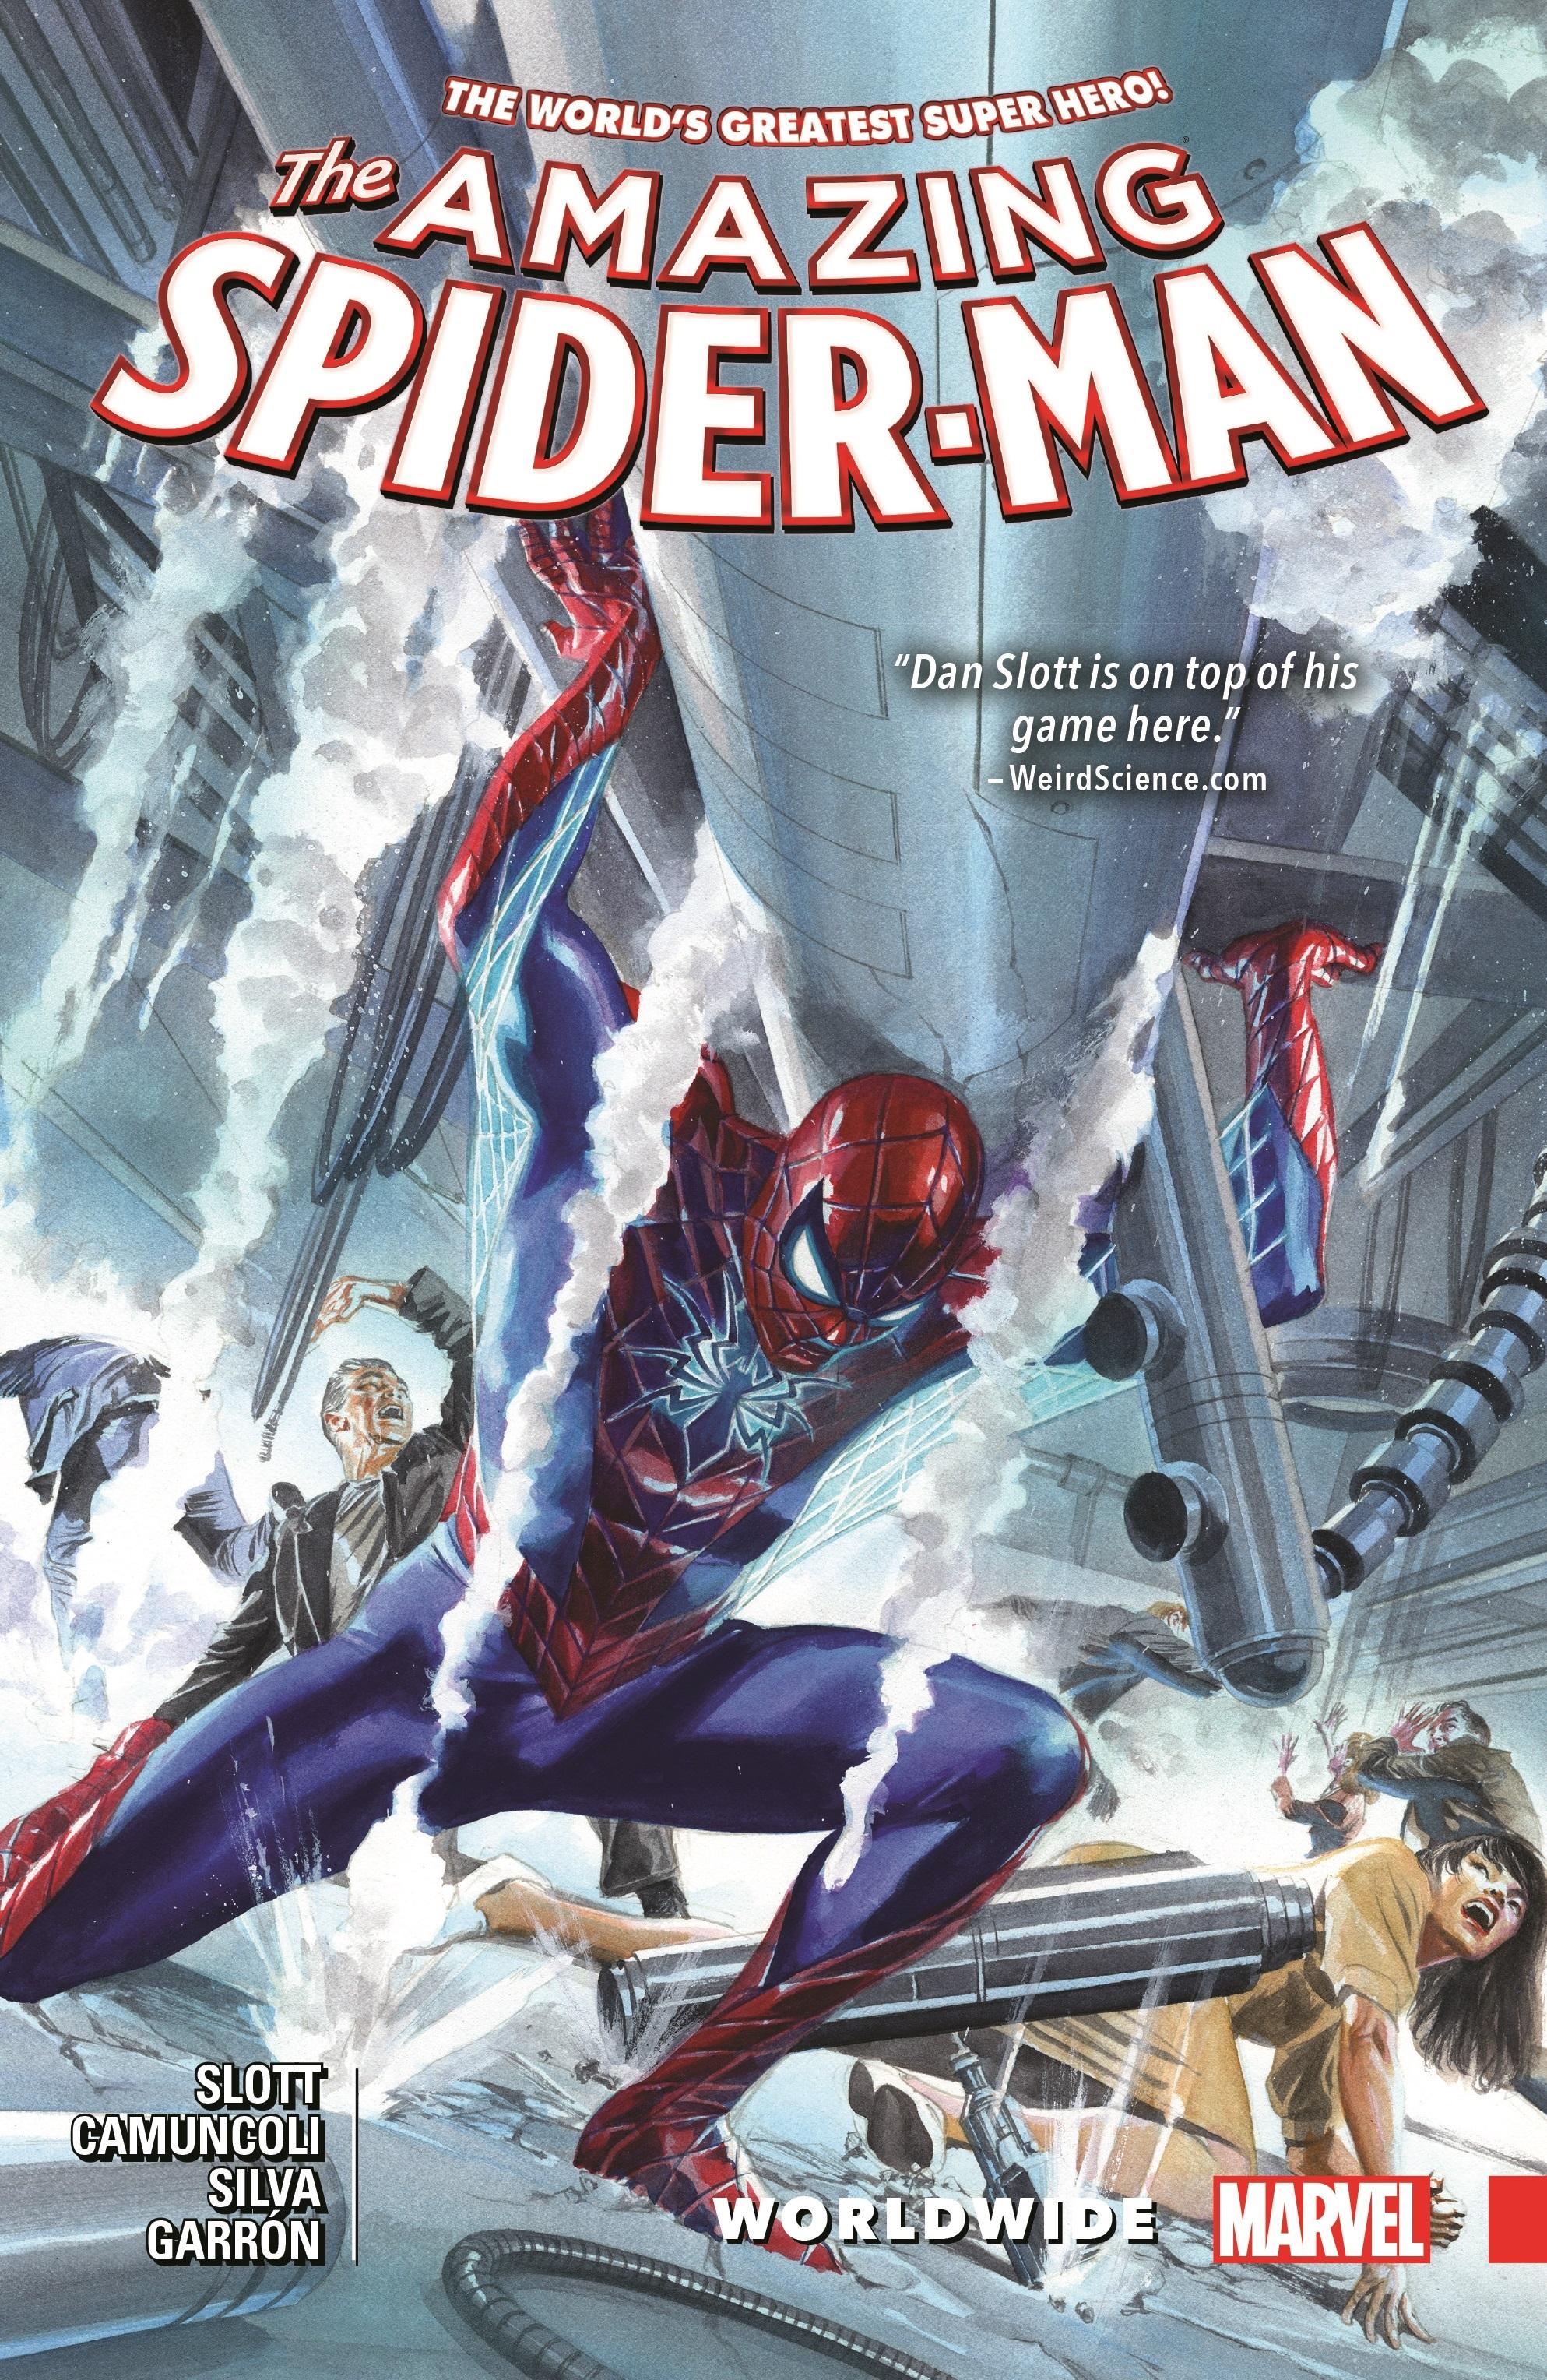 Amazing Spider-Man: Worldwide Vol. 4 (Trade Paperback)